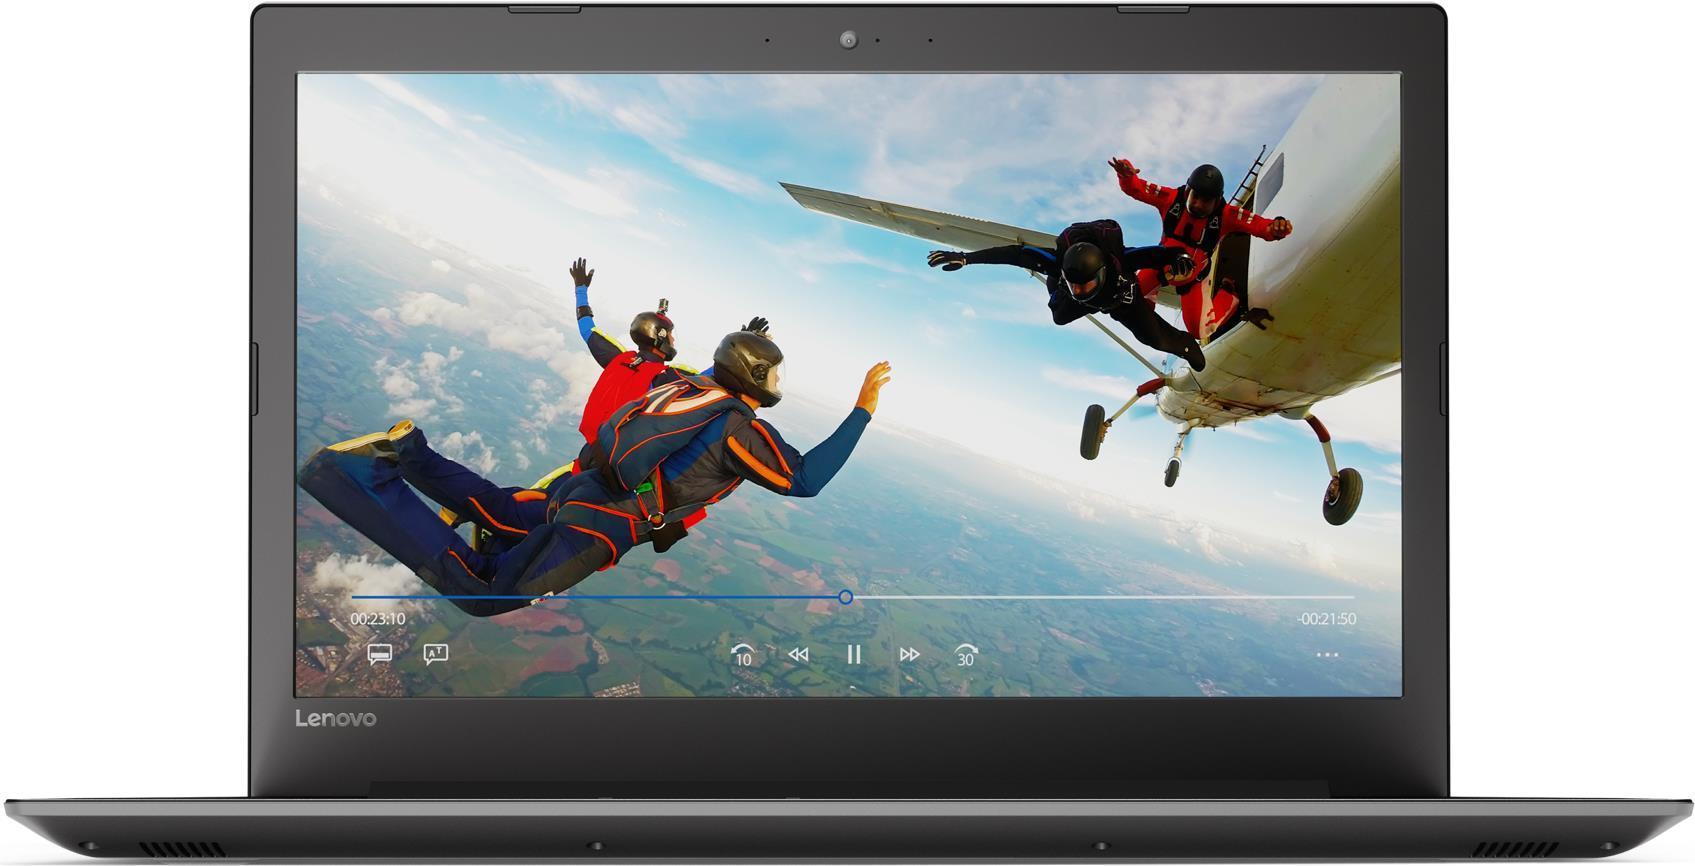 Notebooks, Laptops - Lenovo IdeaPad 320 17IKBR Notebook 43.9cm 17.3 8GB 1TB 128GB SSD 3,4 GHz (81BJ000CGE)  - Onlineshop JACOB Elektronik